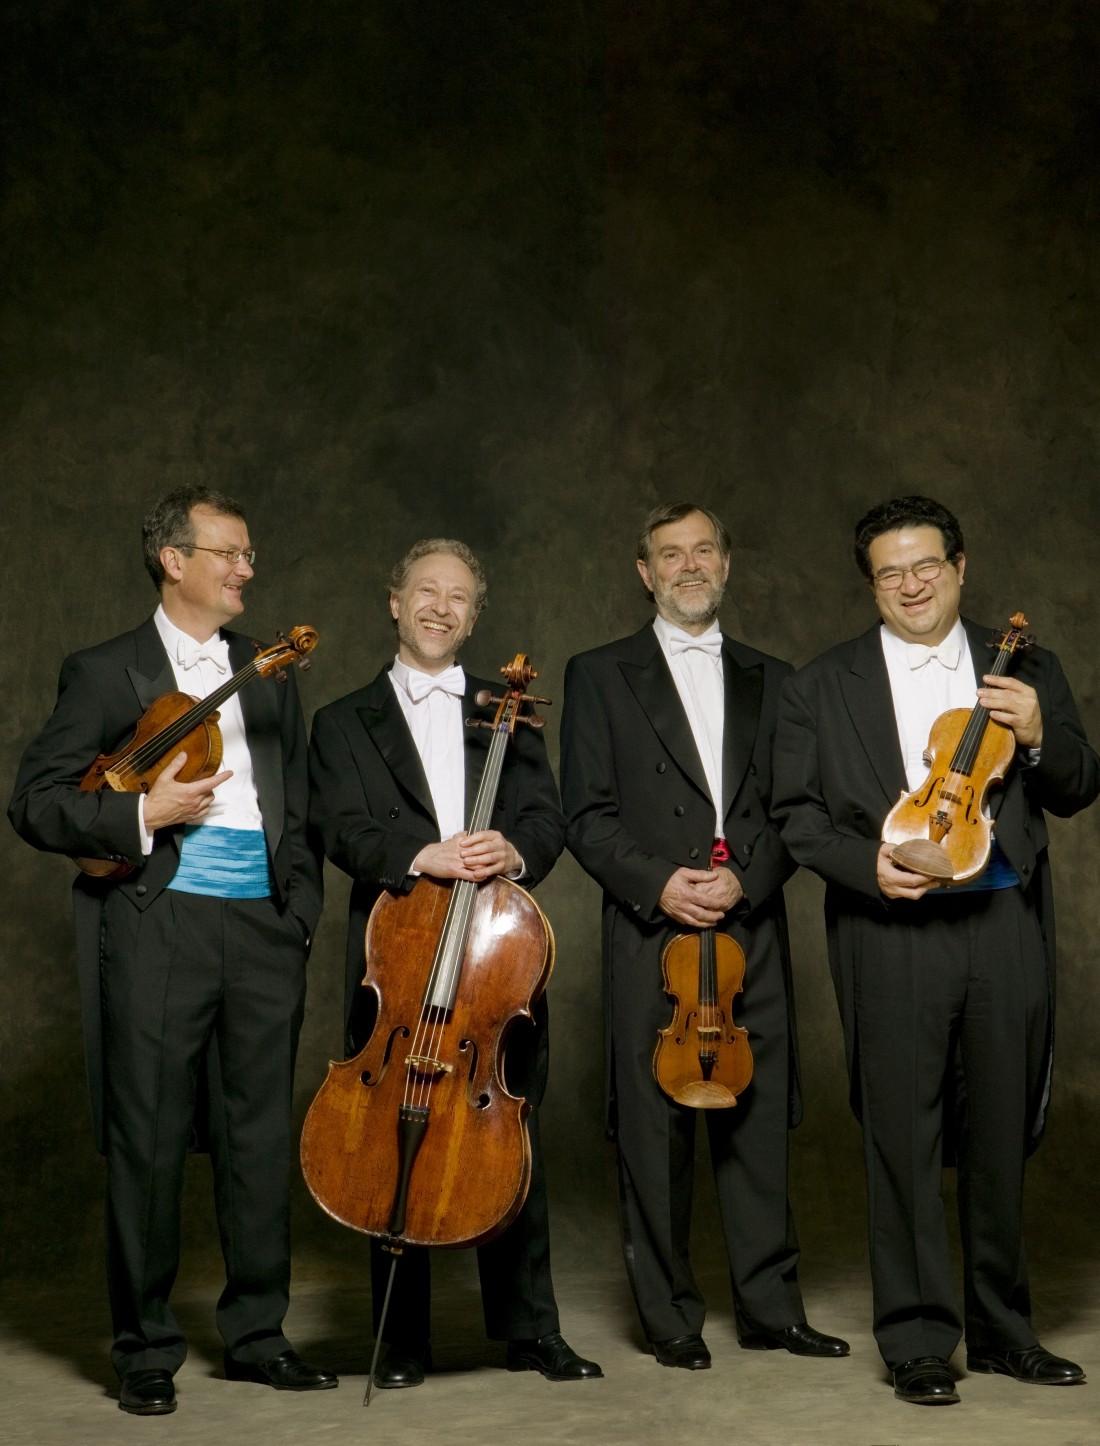 The Endellion String Quartet play at Lancaster University's Great Hall on 17 November 2016